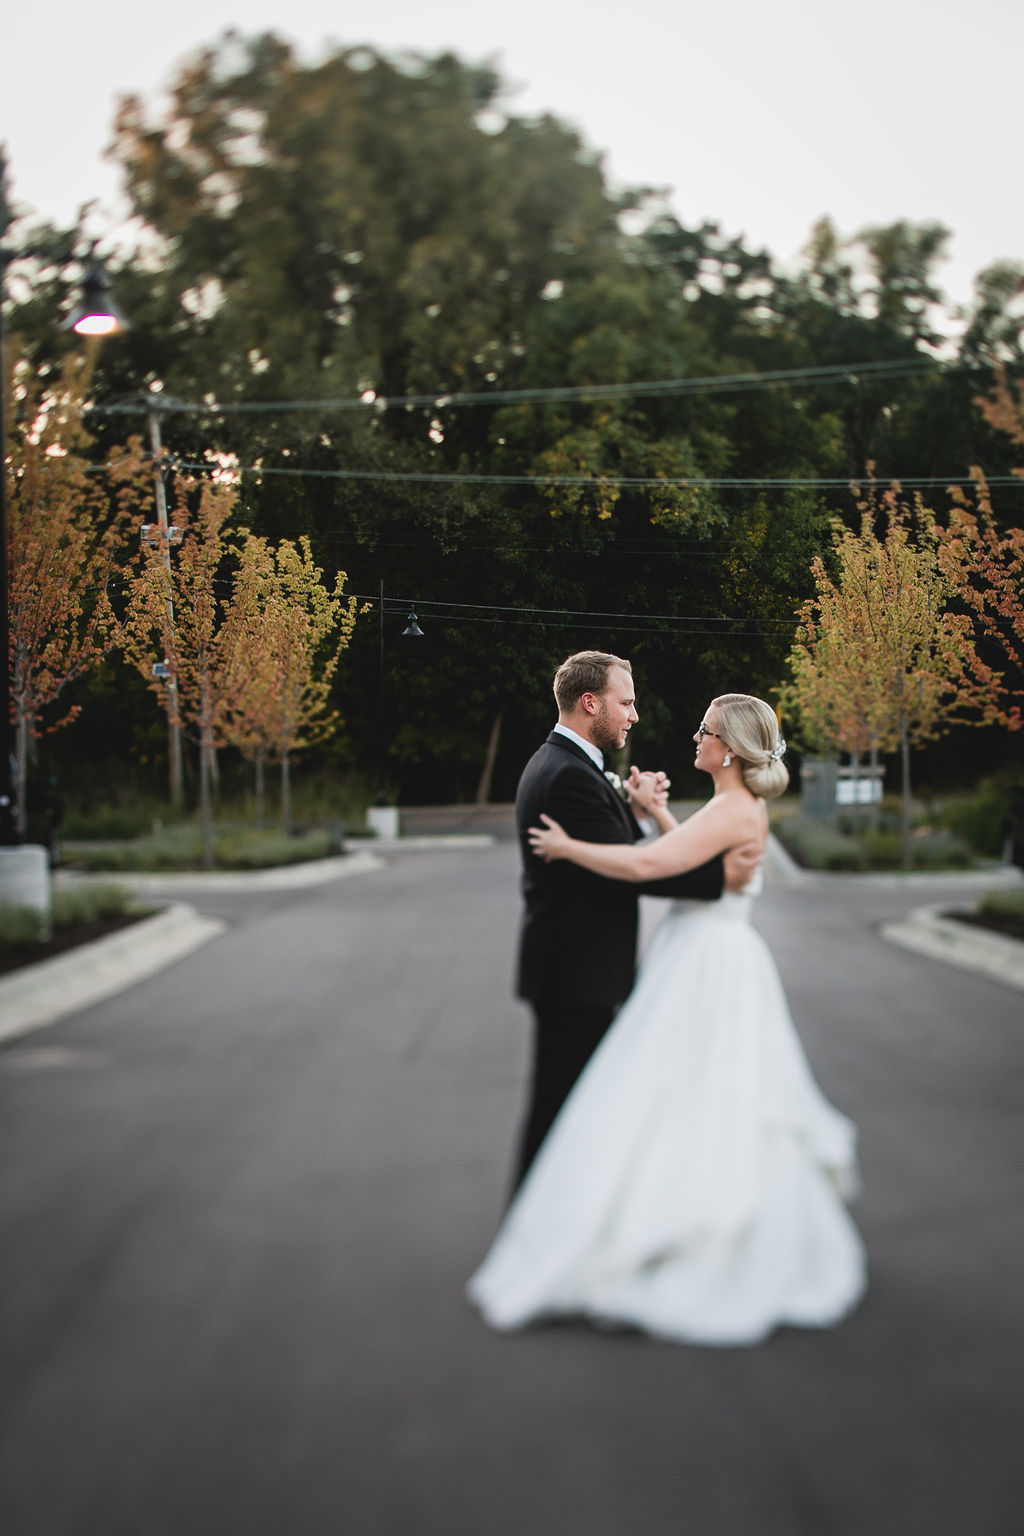 Kelly and Matt | Hutton House parking lot golden hour September wedding | Aqua Fox Photography | Sixpence Events and Planning Minnesota Wedding Planner102.jpg